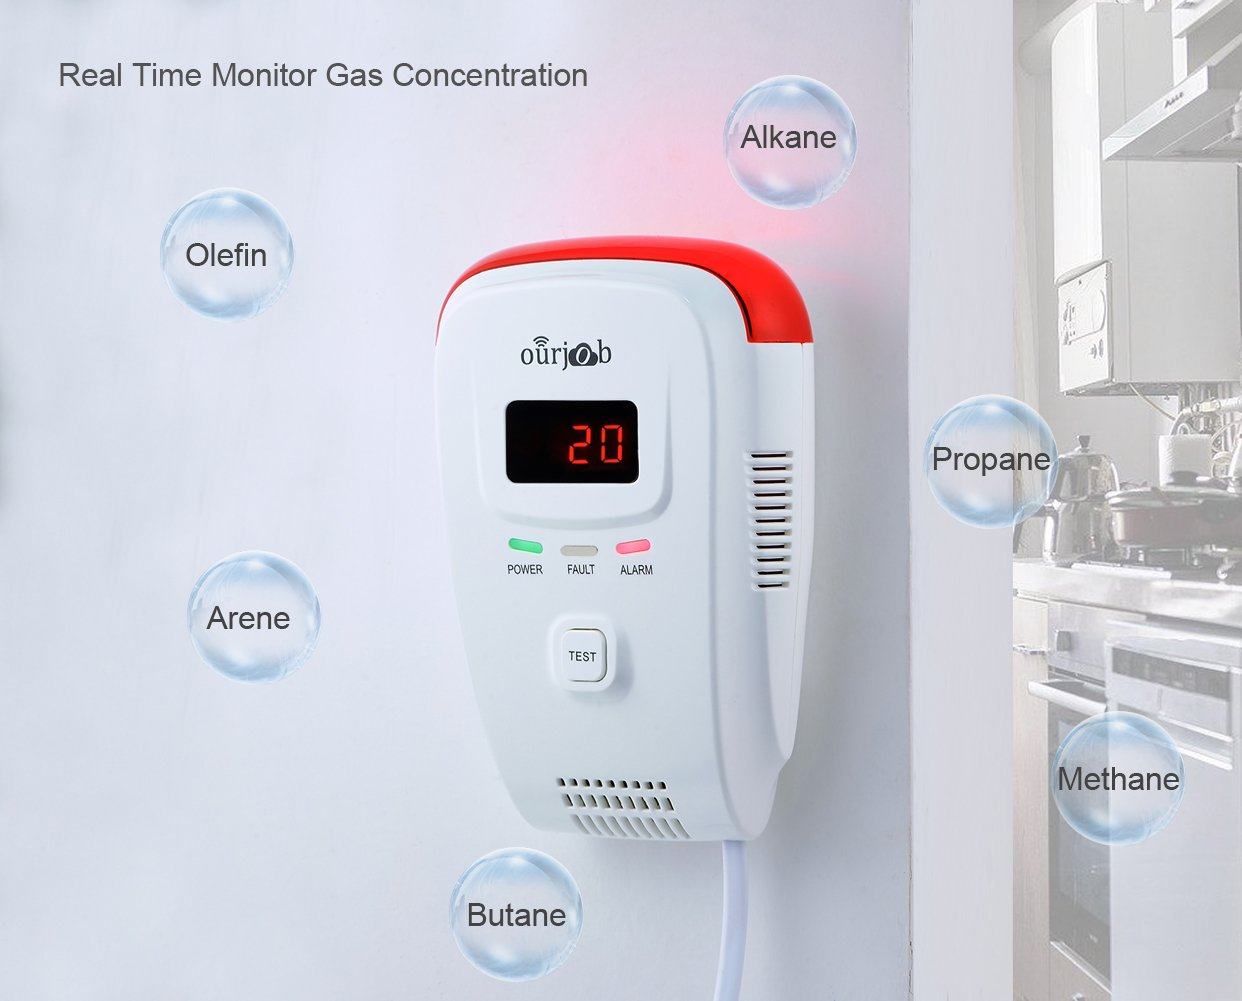 Bianco Ourjob GPL//Gas naturale//Rilevatore di gas di carbone Sensore Plug-in Allarme Gas Metano Rilevatore di Gas Combustibile con Allarme Vocale e Display digitale Rilevatore di gas